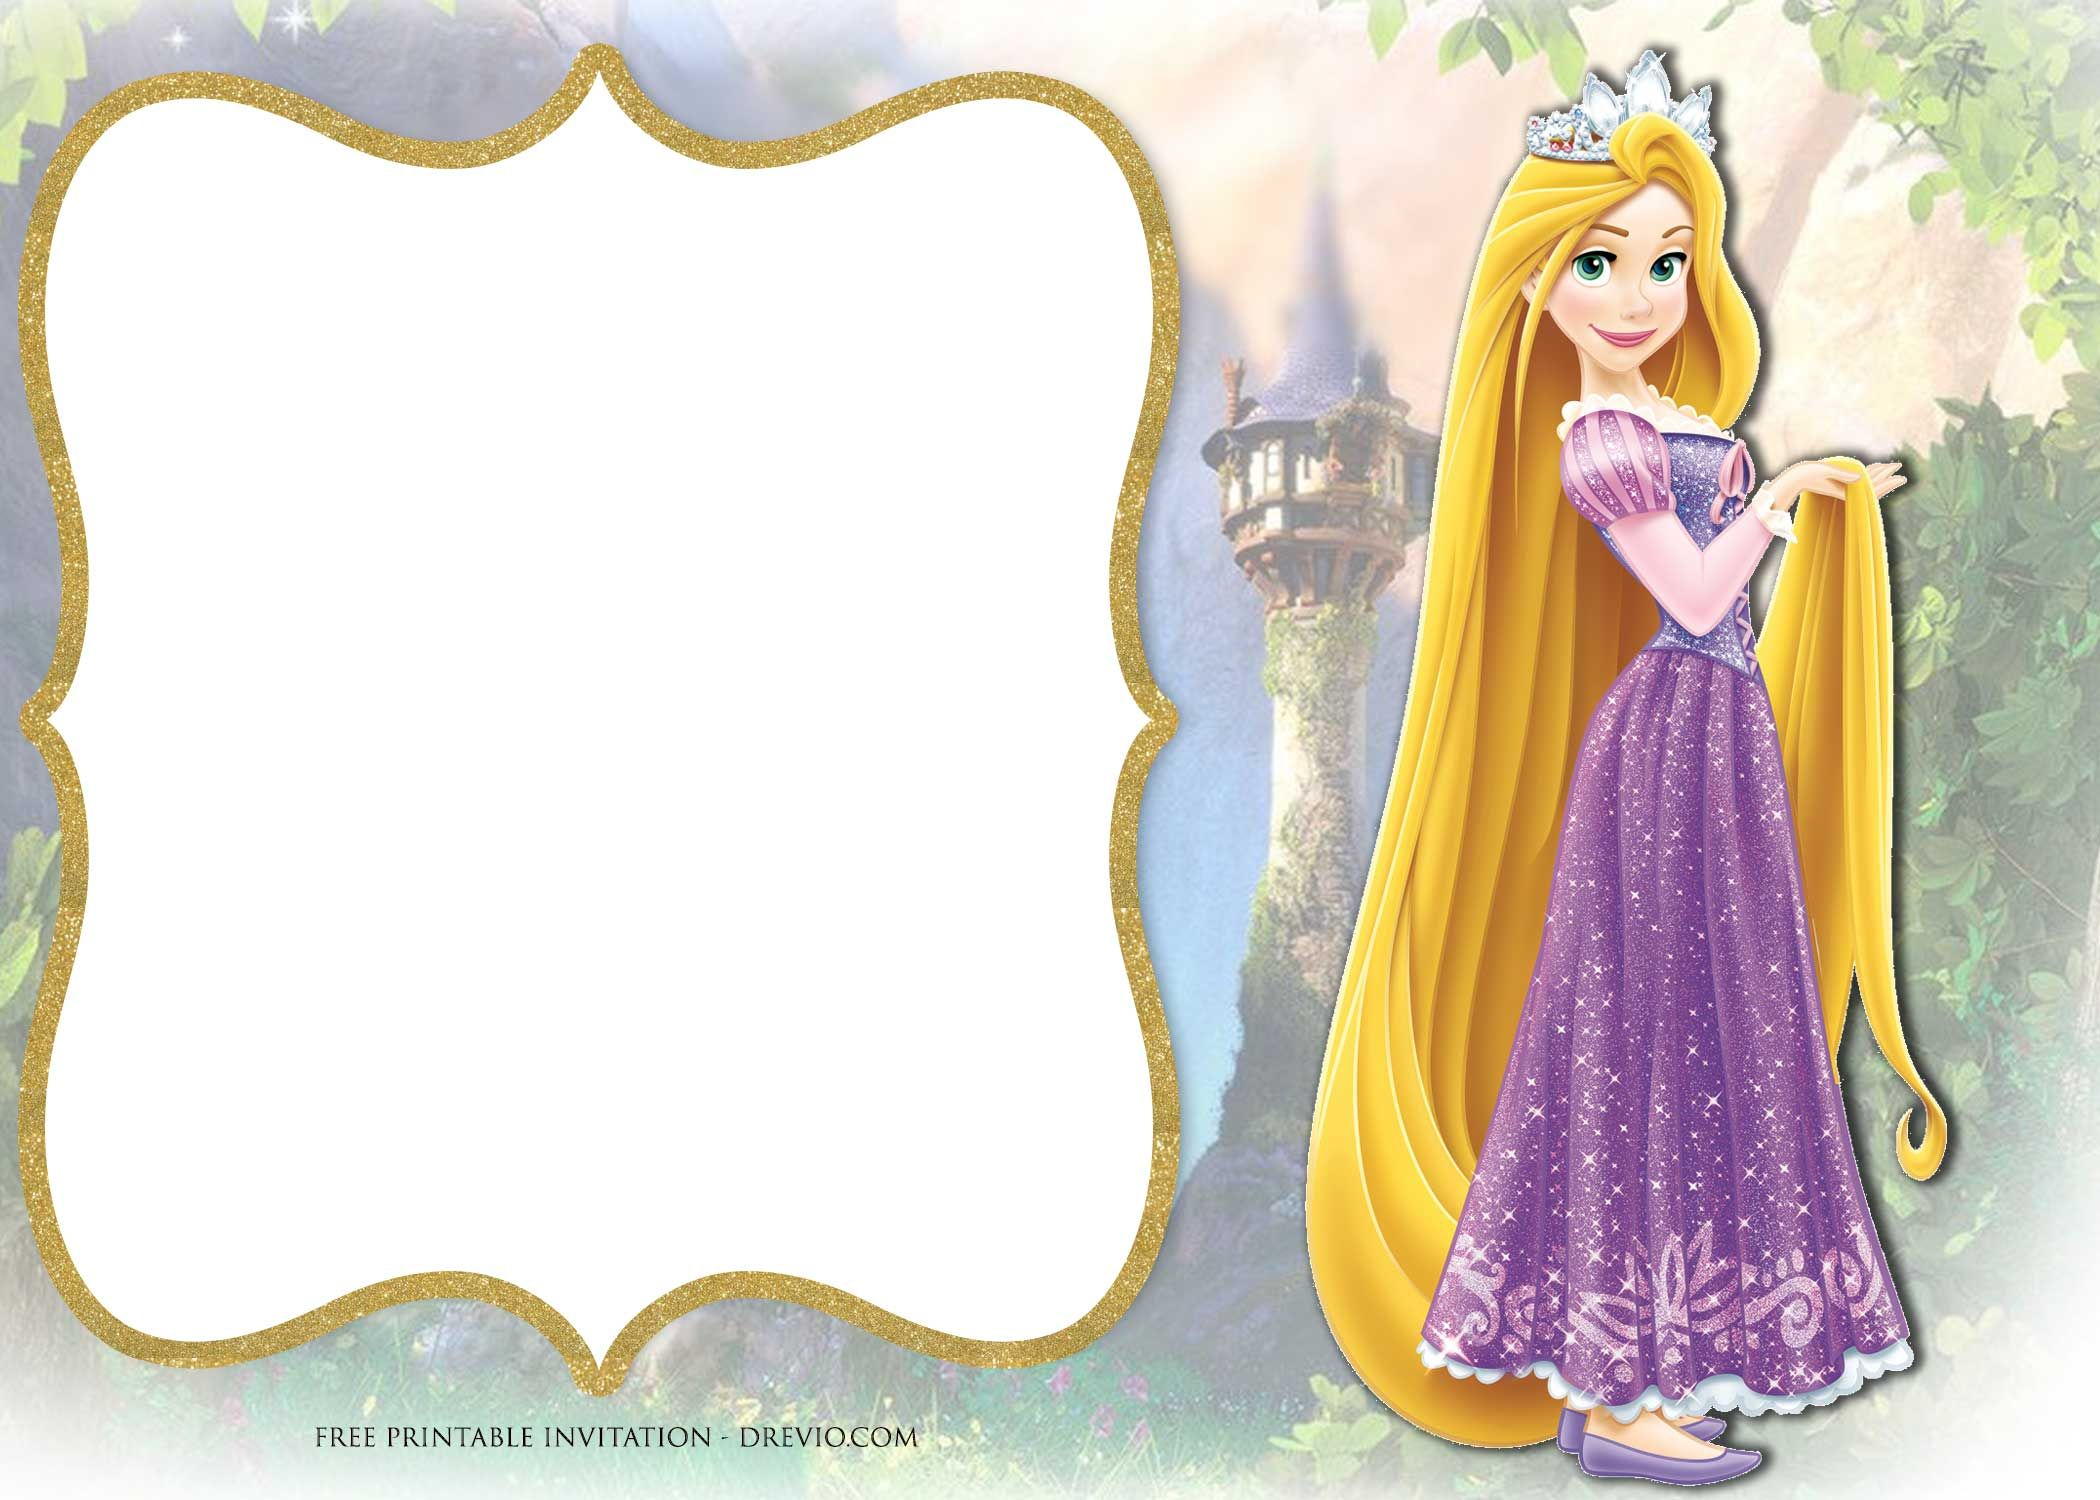 Free Printable Princess Rapunzel Invitation Templates Rapunzel Invitations Rapunzel Birthday Invitation Free Printable Birthday Invitations